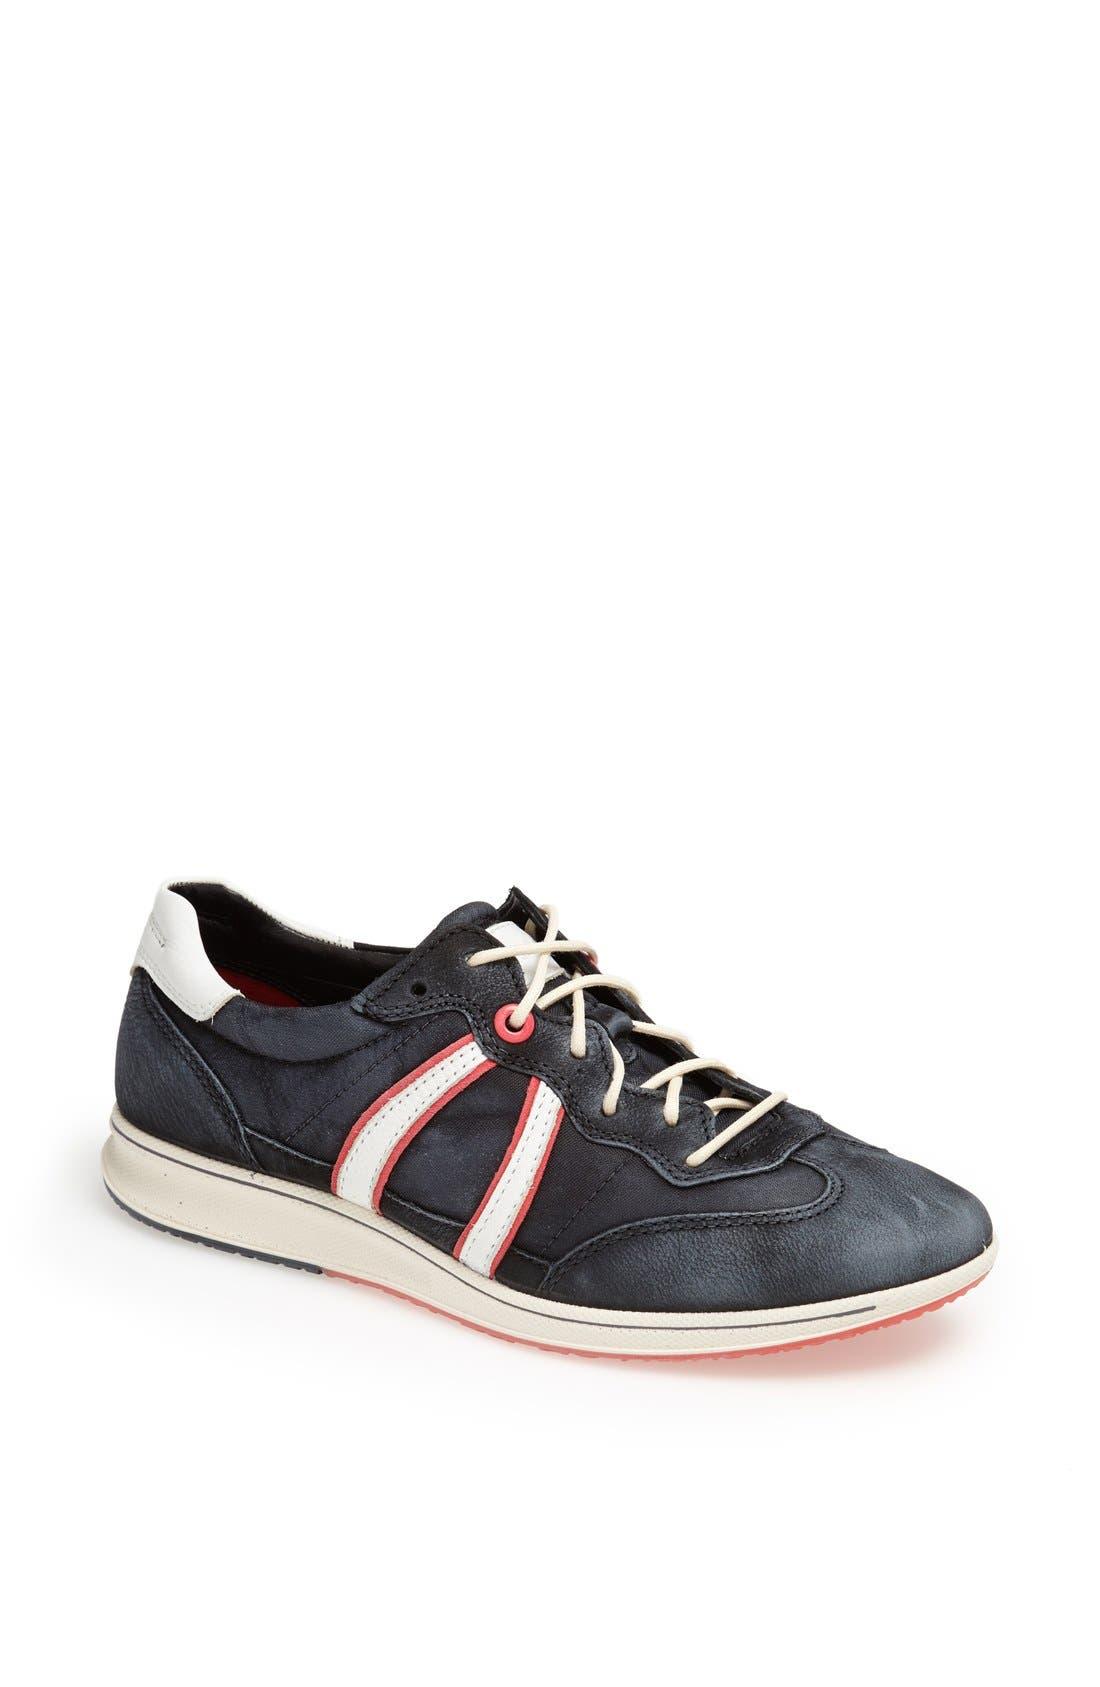 Main Image - ECCO 'Jogga' Sneaker (Women)